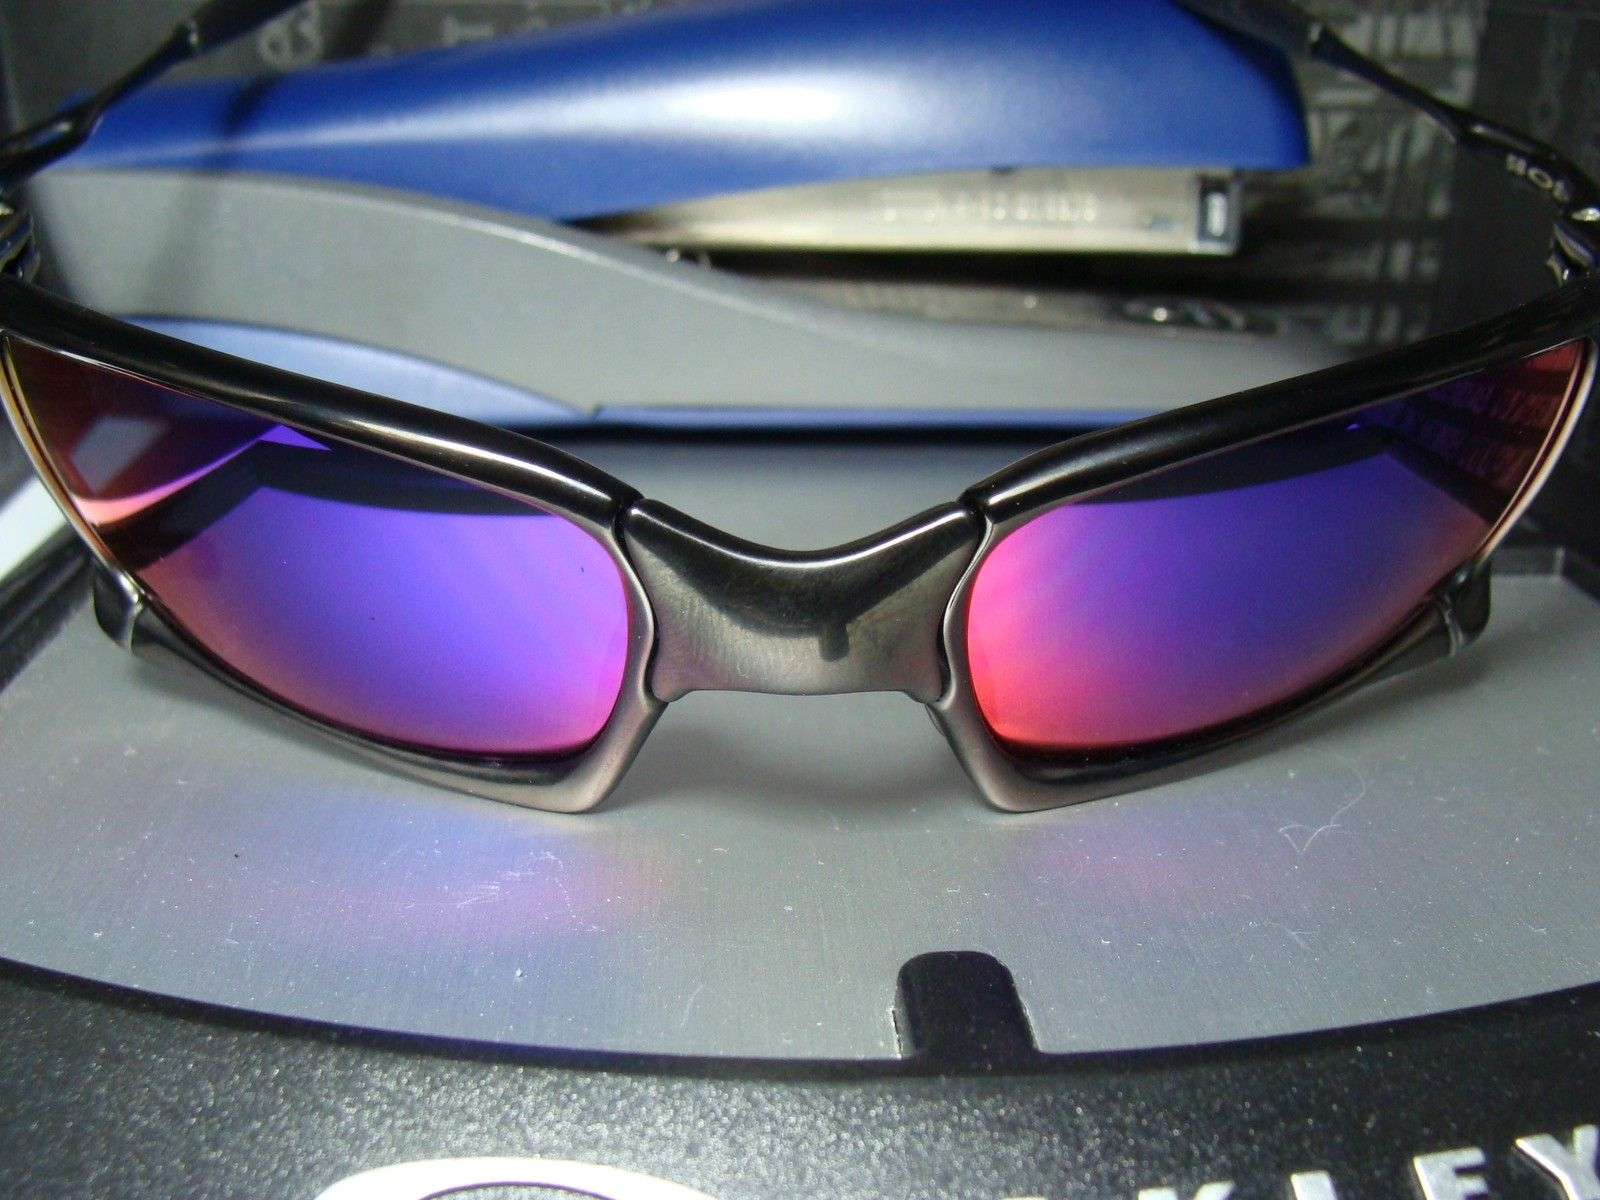 Custom Cut XS Pos Red Lenses, Freshly Cut From Oakley Donor - DSC04585.JPG